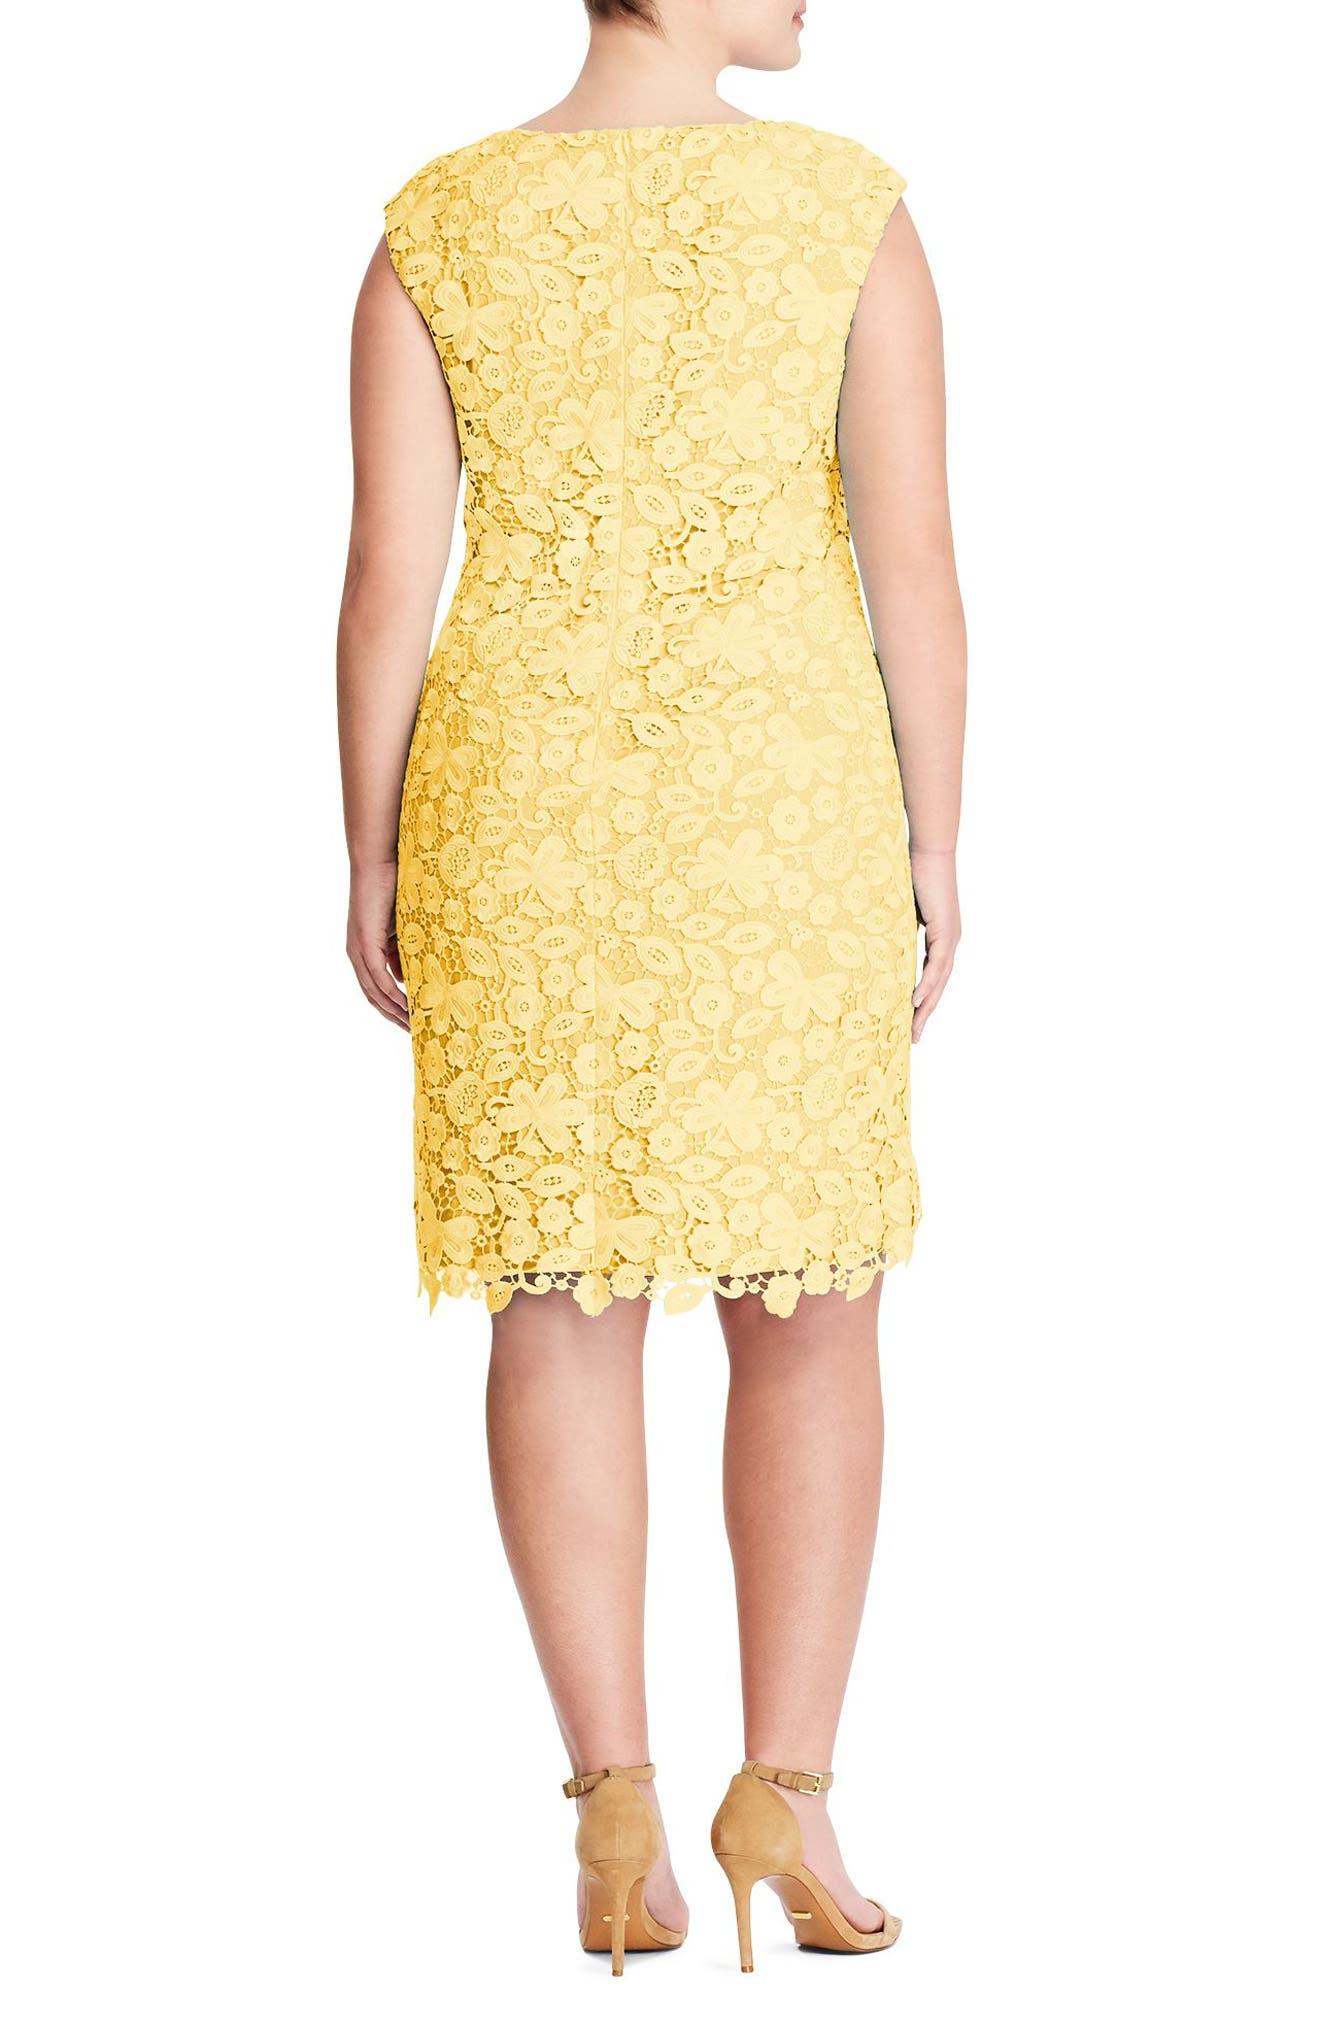 Montie Lace Sheath Dress,                             Alternate thumbnail 2, color,                             Island Yellow